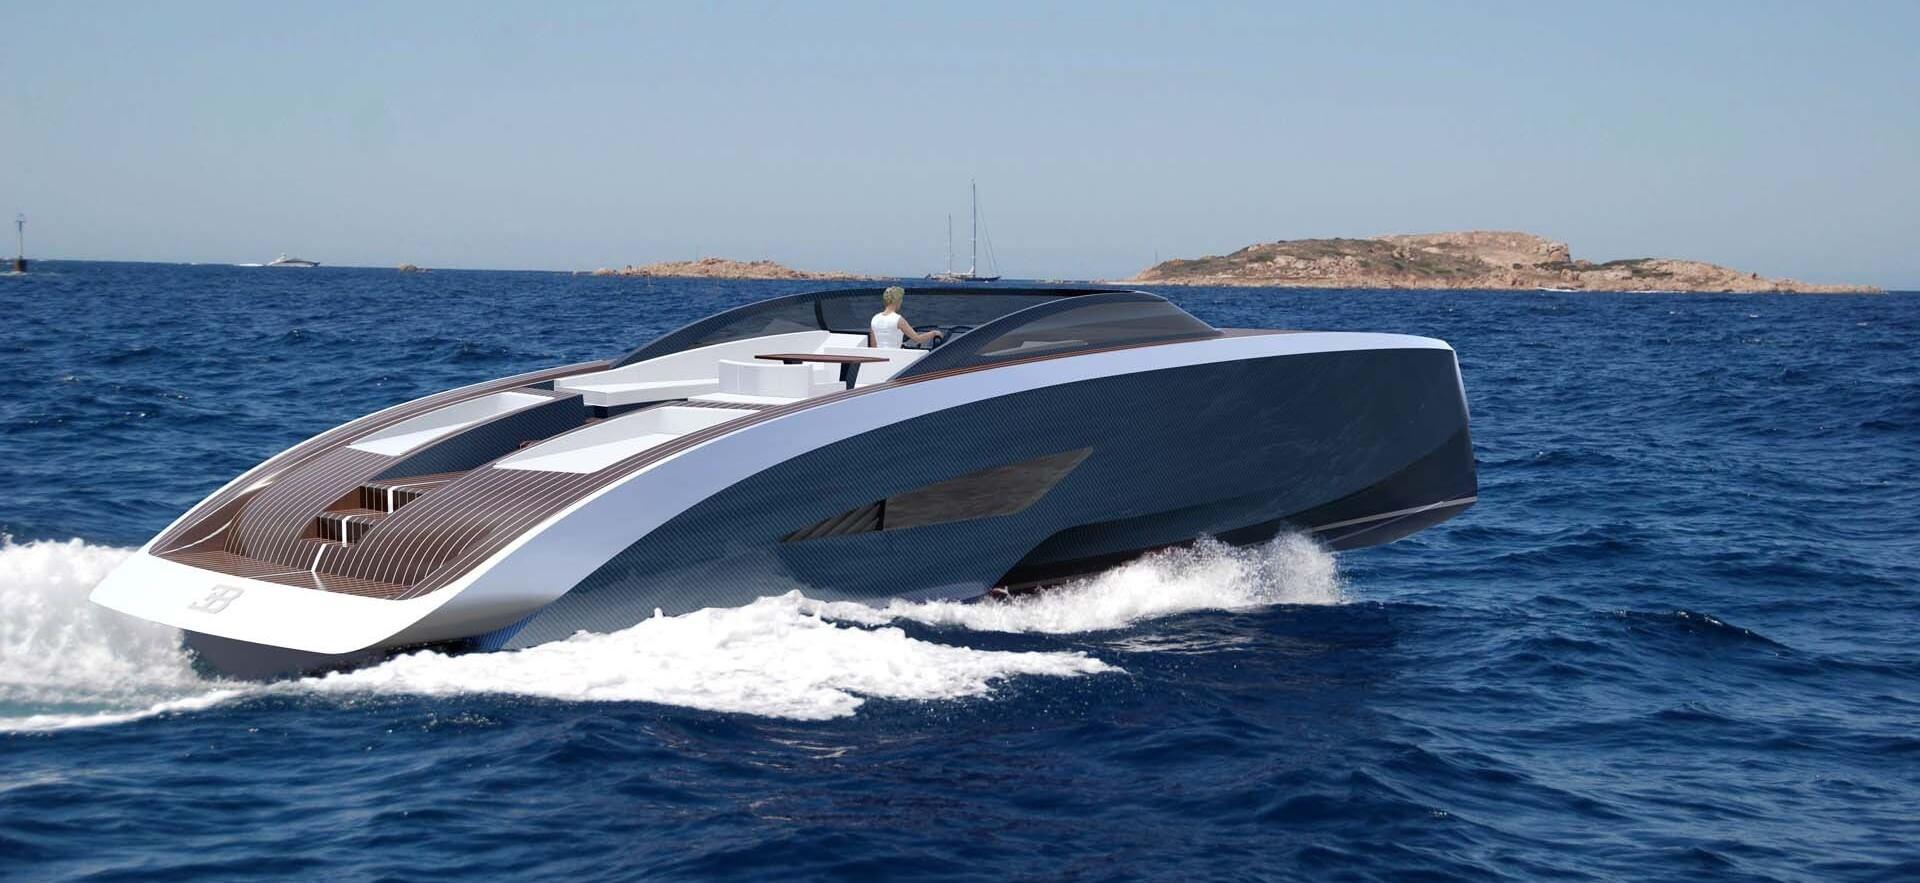 palmer johnson niniette yacht inspired by bugatti 100537701 h e1449359263261